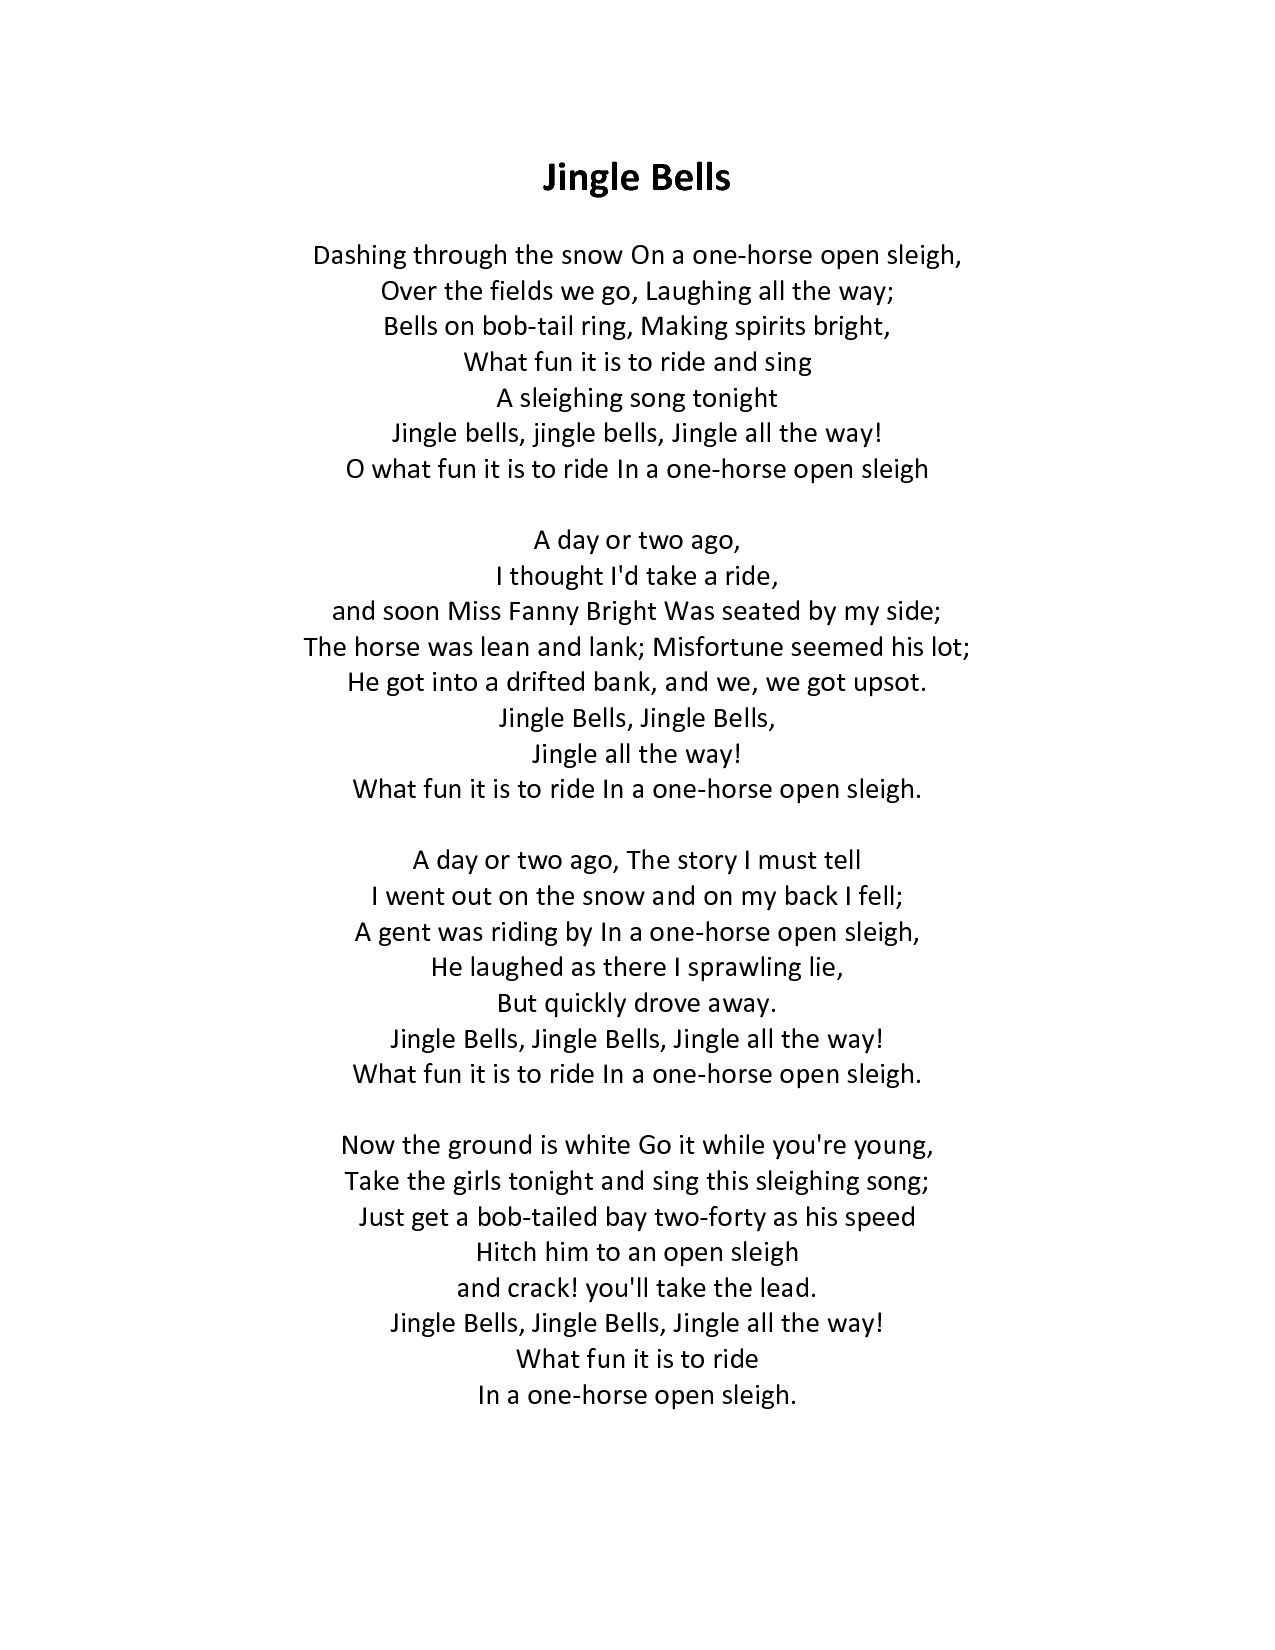 Jingle Bells Lyrics! Jingle bells lyrics, Making